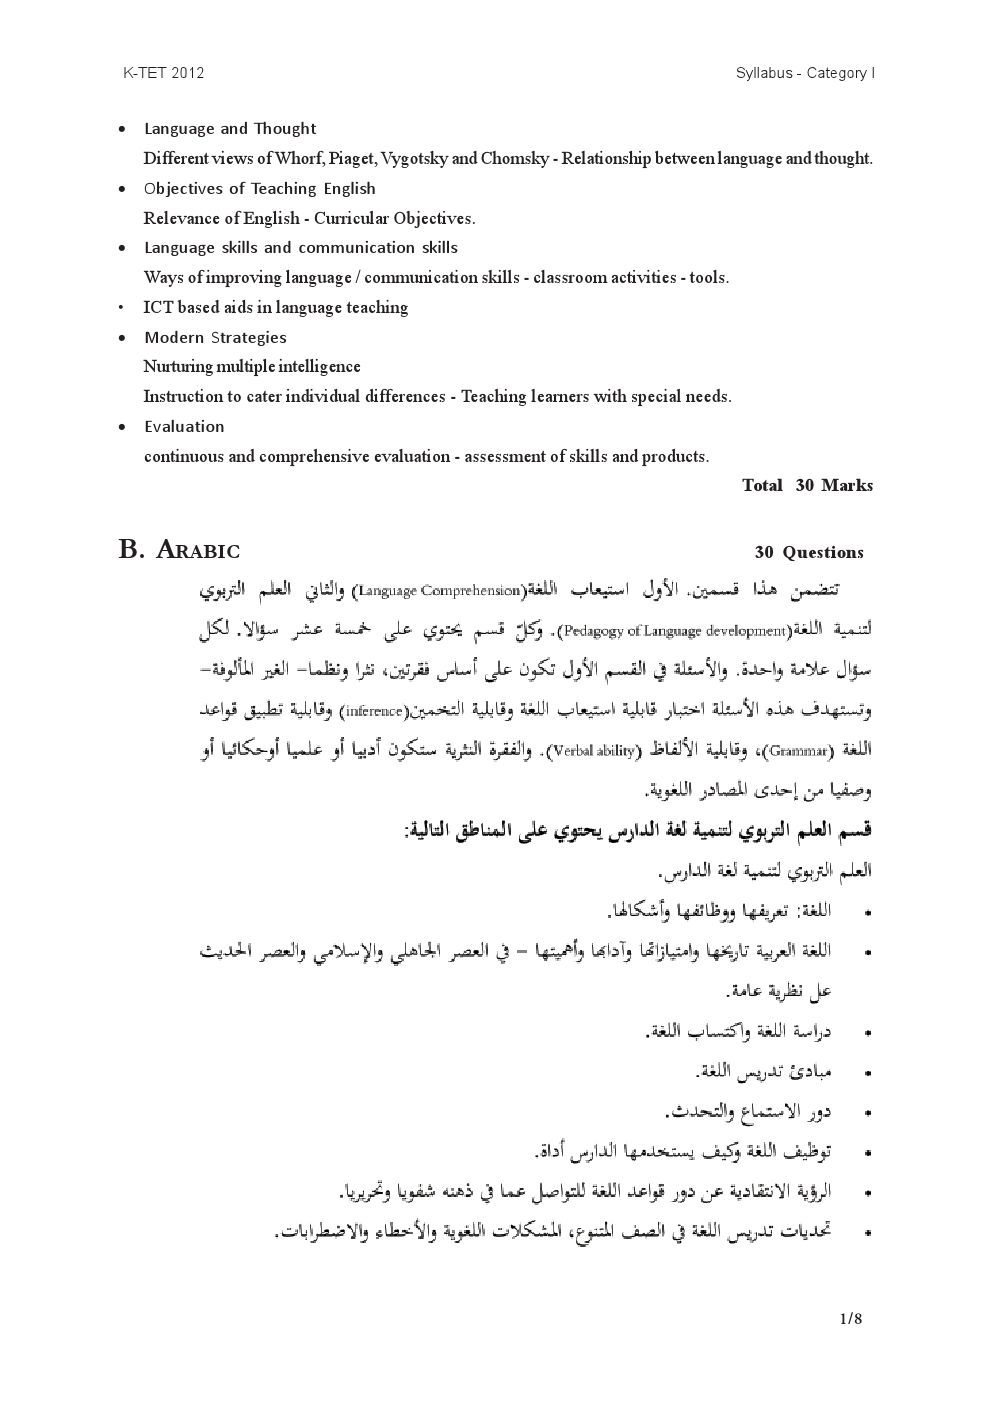 http://masterstudy.net/pdf/syllabus10008.jpg